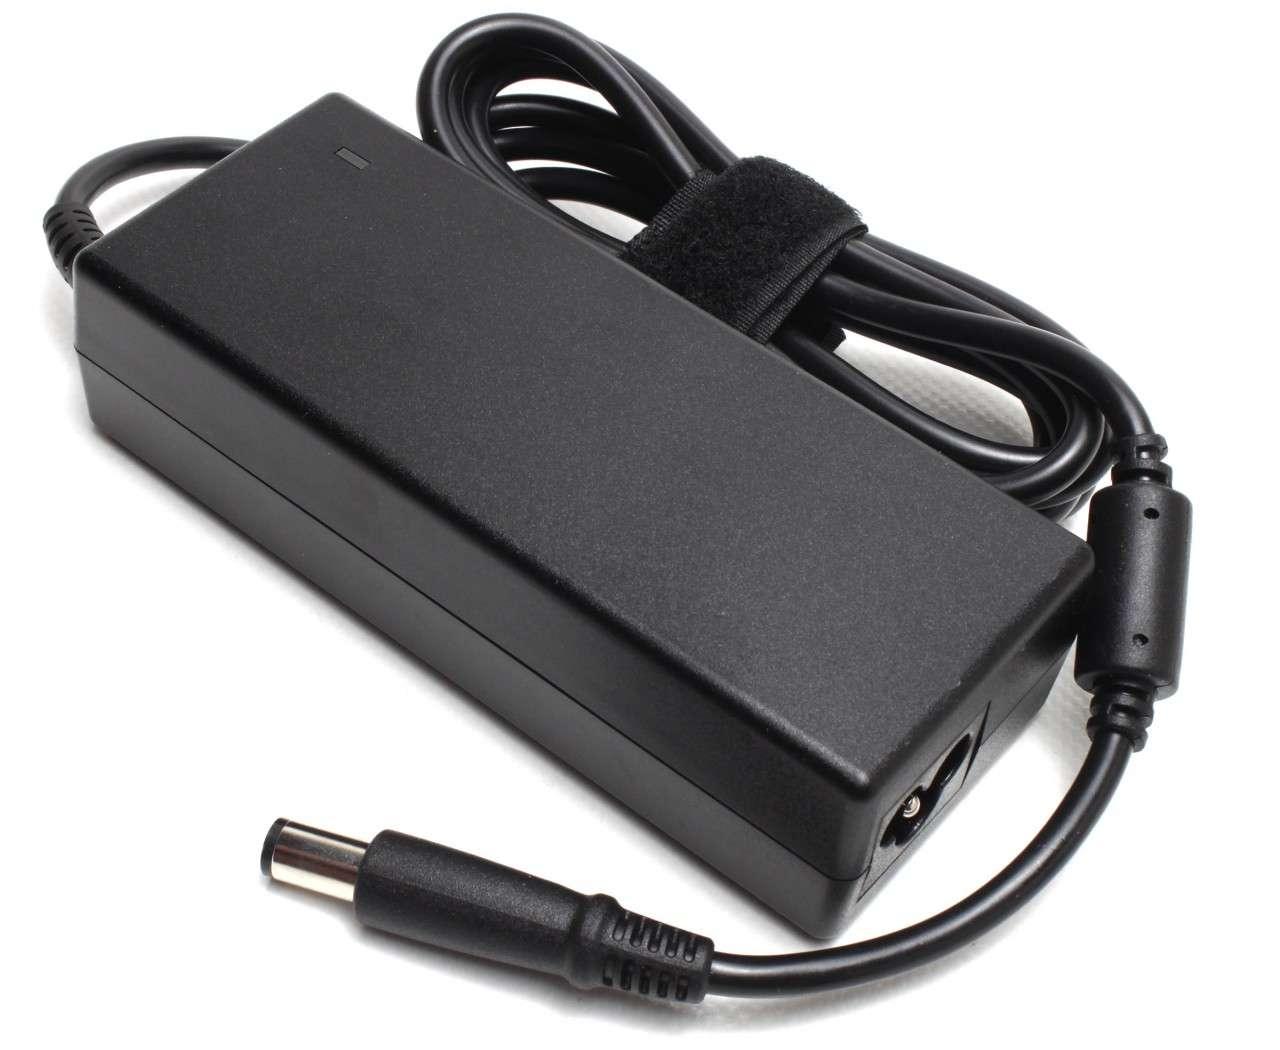 Incarcator Dell Studio XPS 1640 VARIANTA 3 imagine powerlaptop.ro 2021